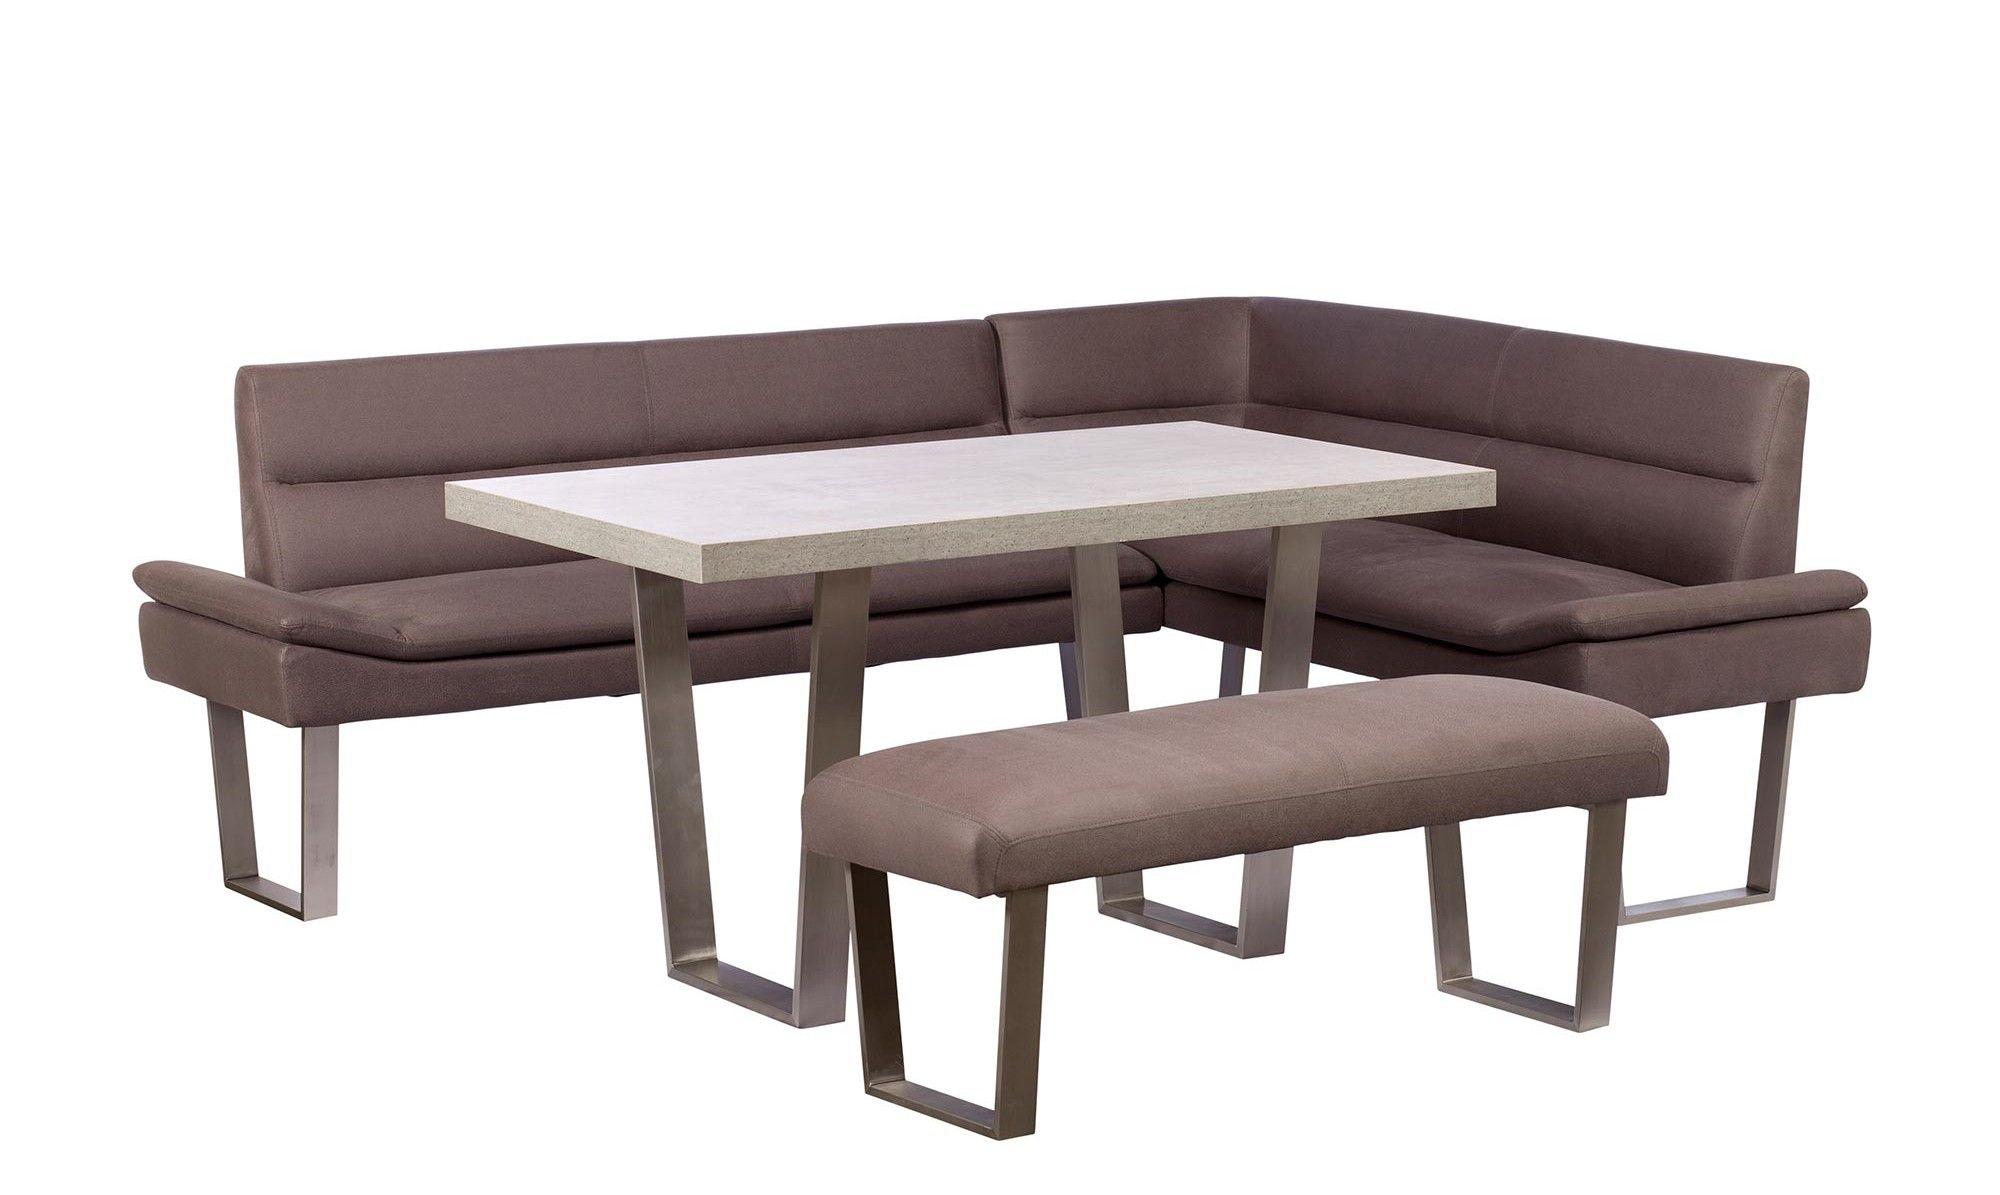 Sia LHF 135cm Corner Dining Table Set Rectangle Table Sets